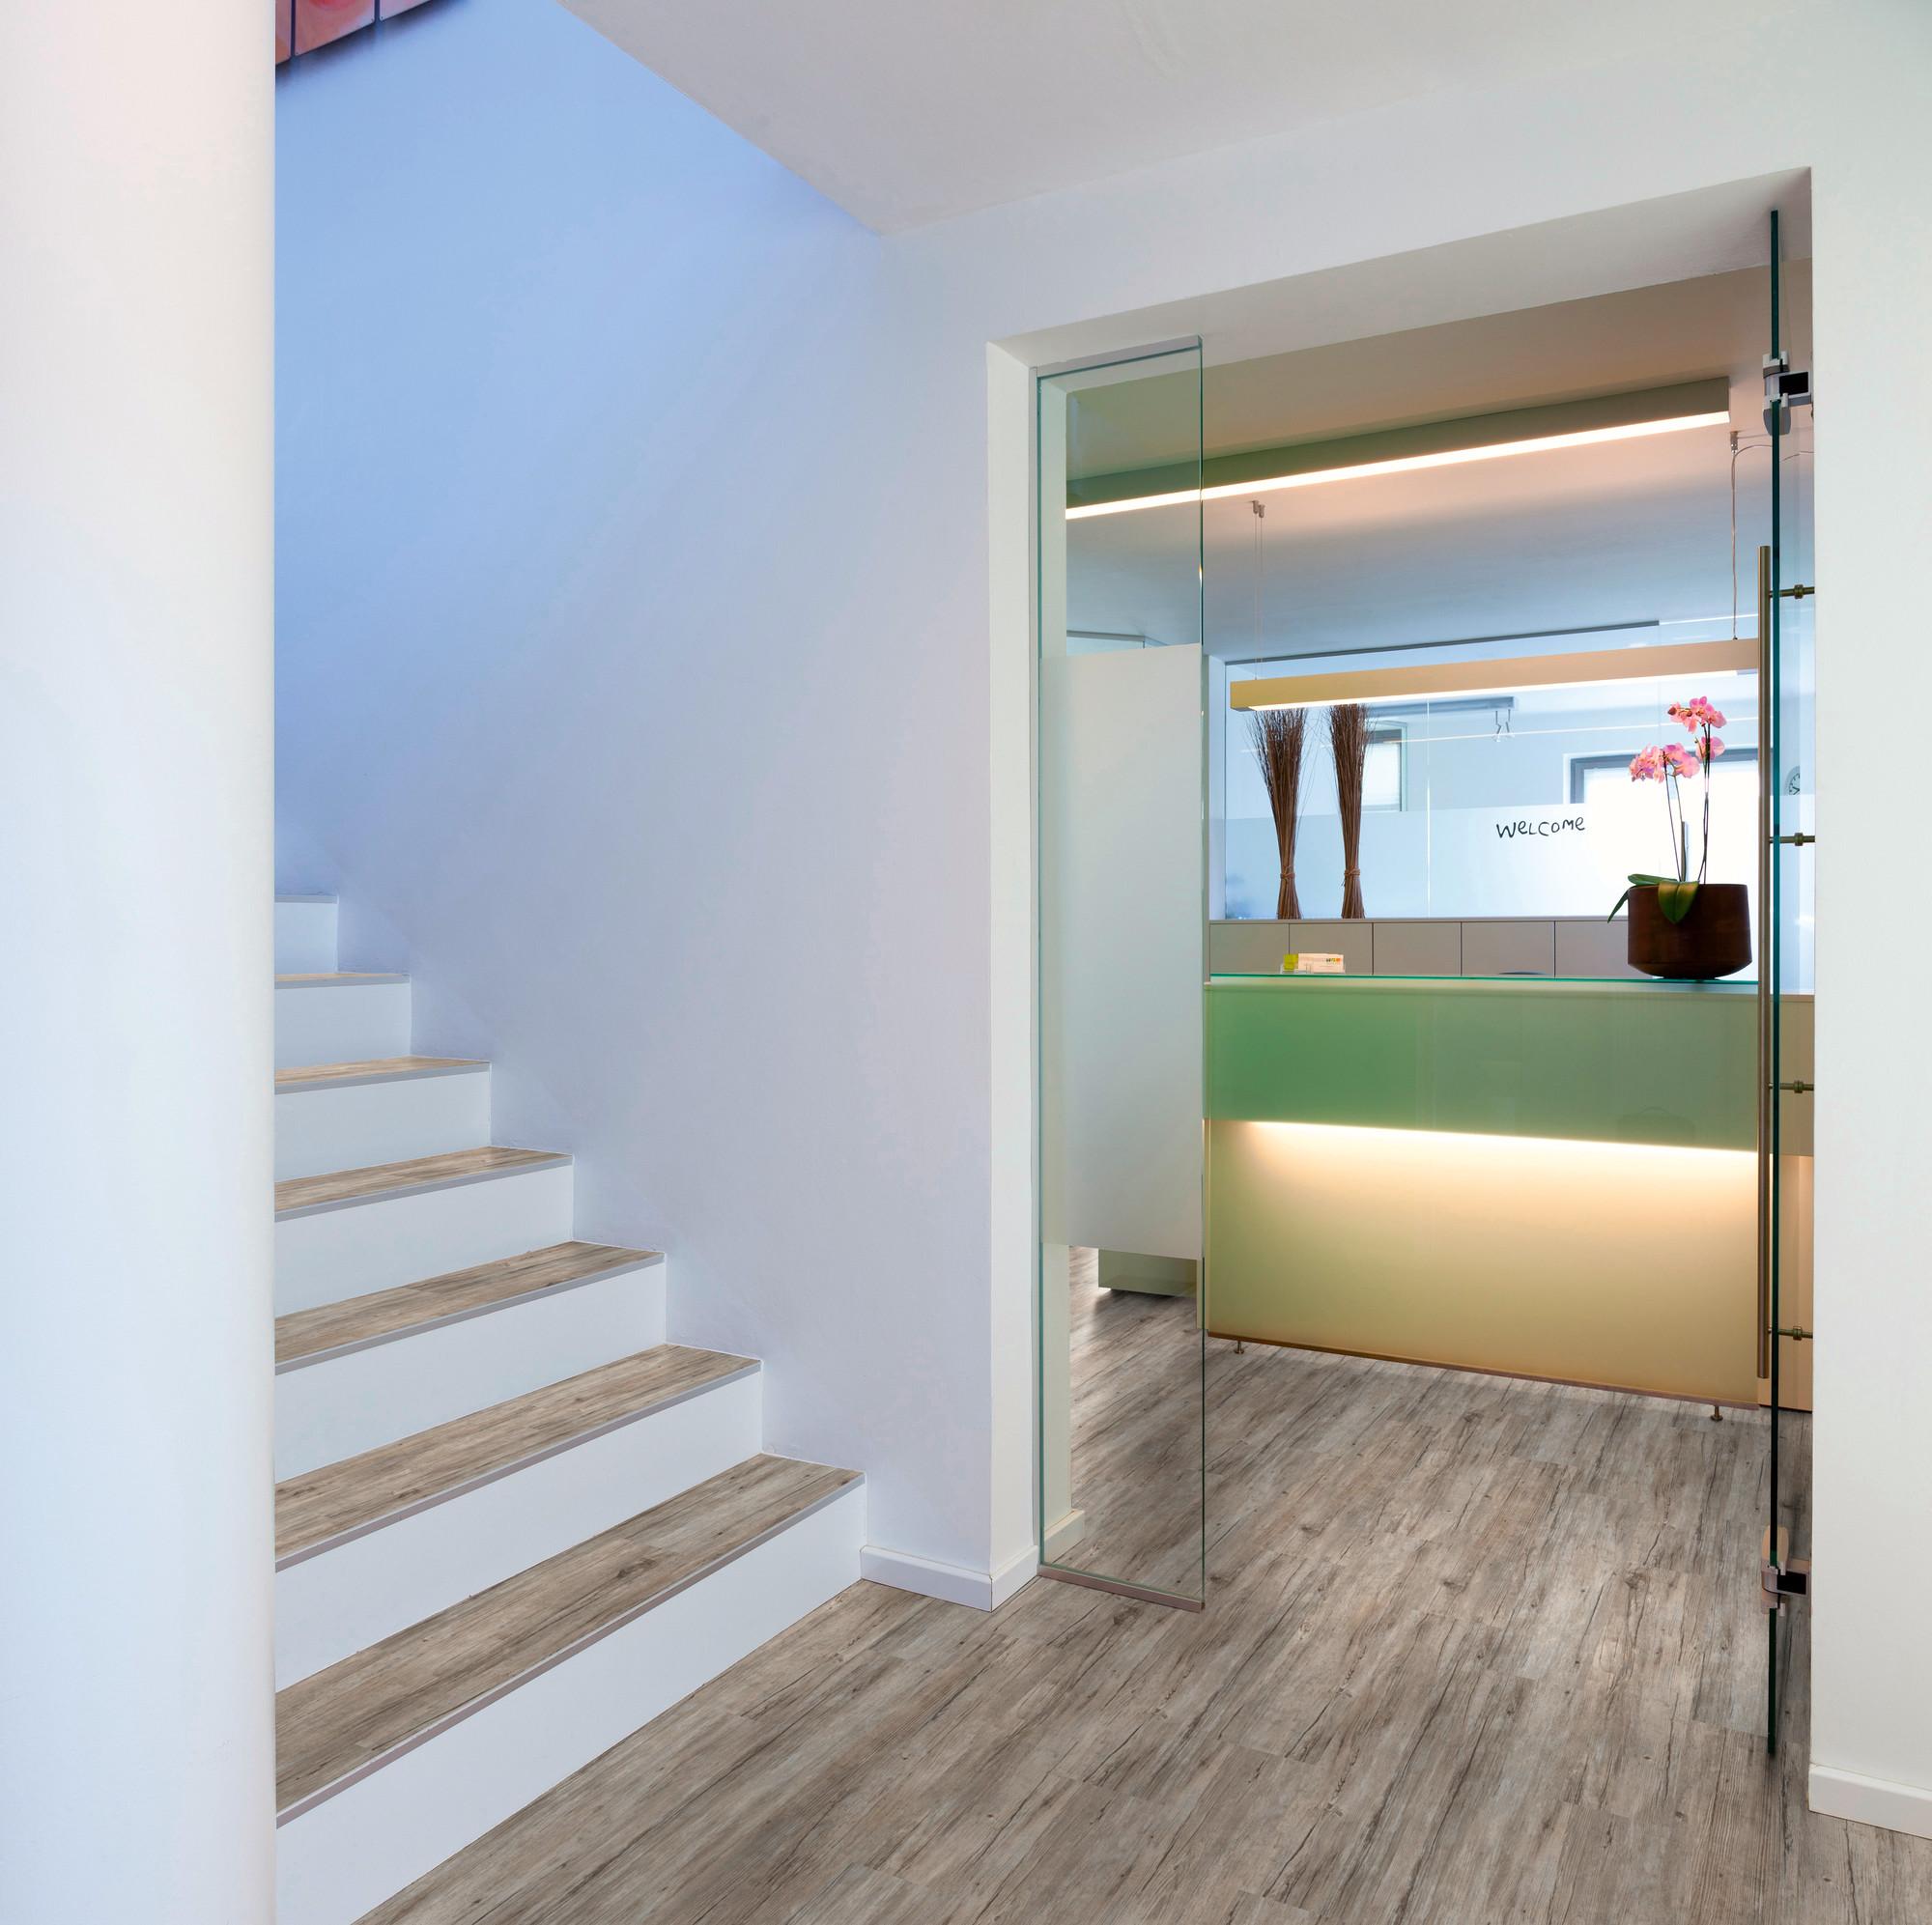 Raumbild - Designboden - Contract 0,55 Planke kleben 1